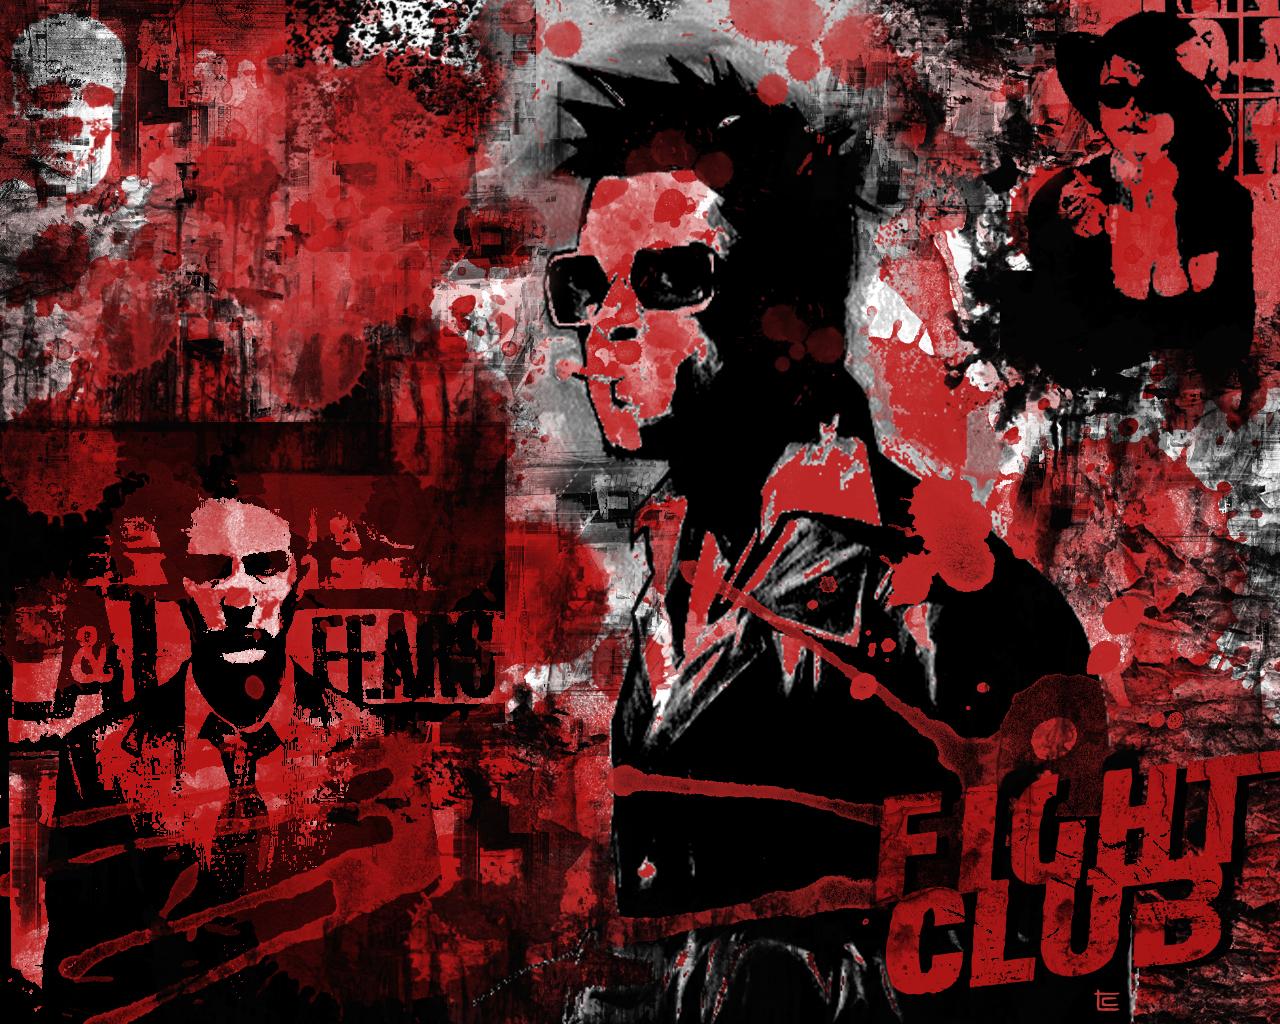 fight club Wallpaper Background 33271 1280x1024